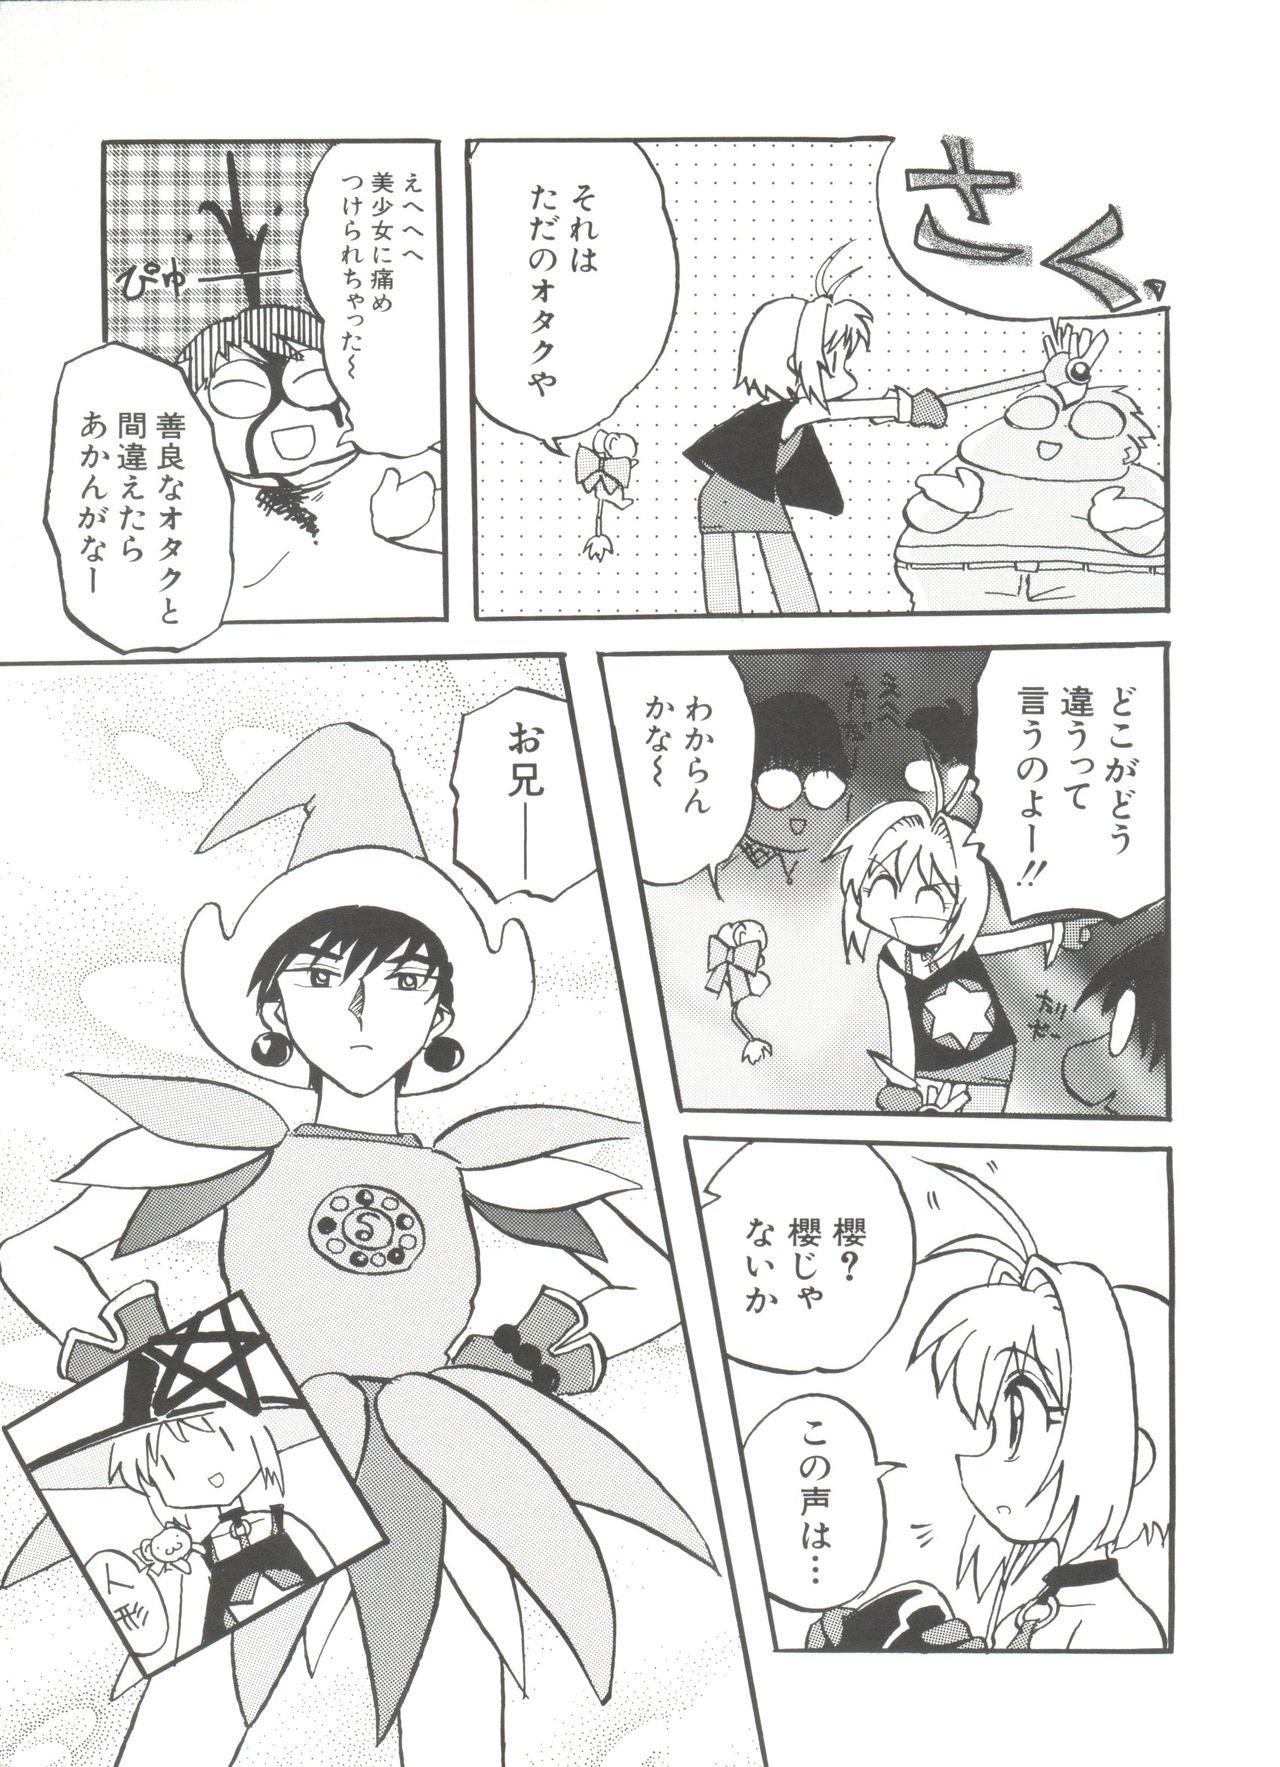 [Anthology] Denei Tamatebako 8 - Utakata no Tenshi-tachi II (Various) 116